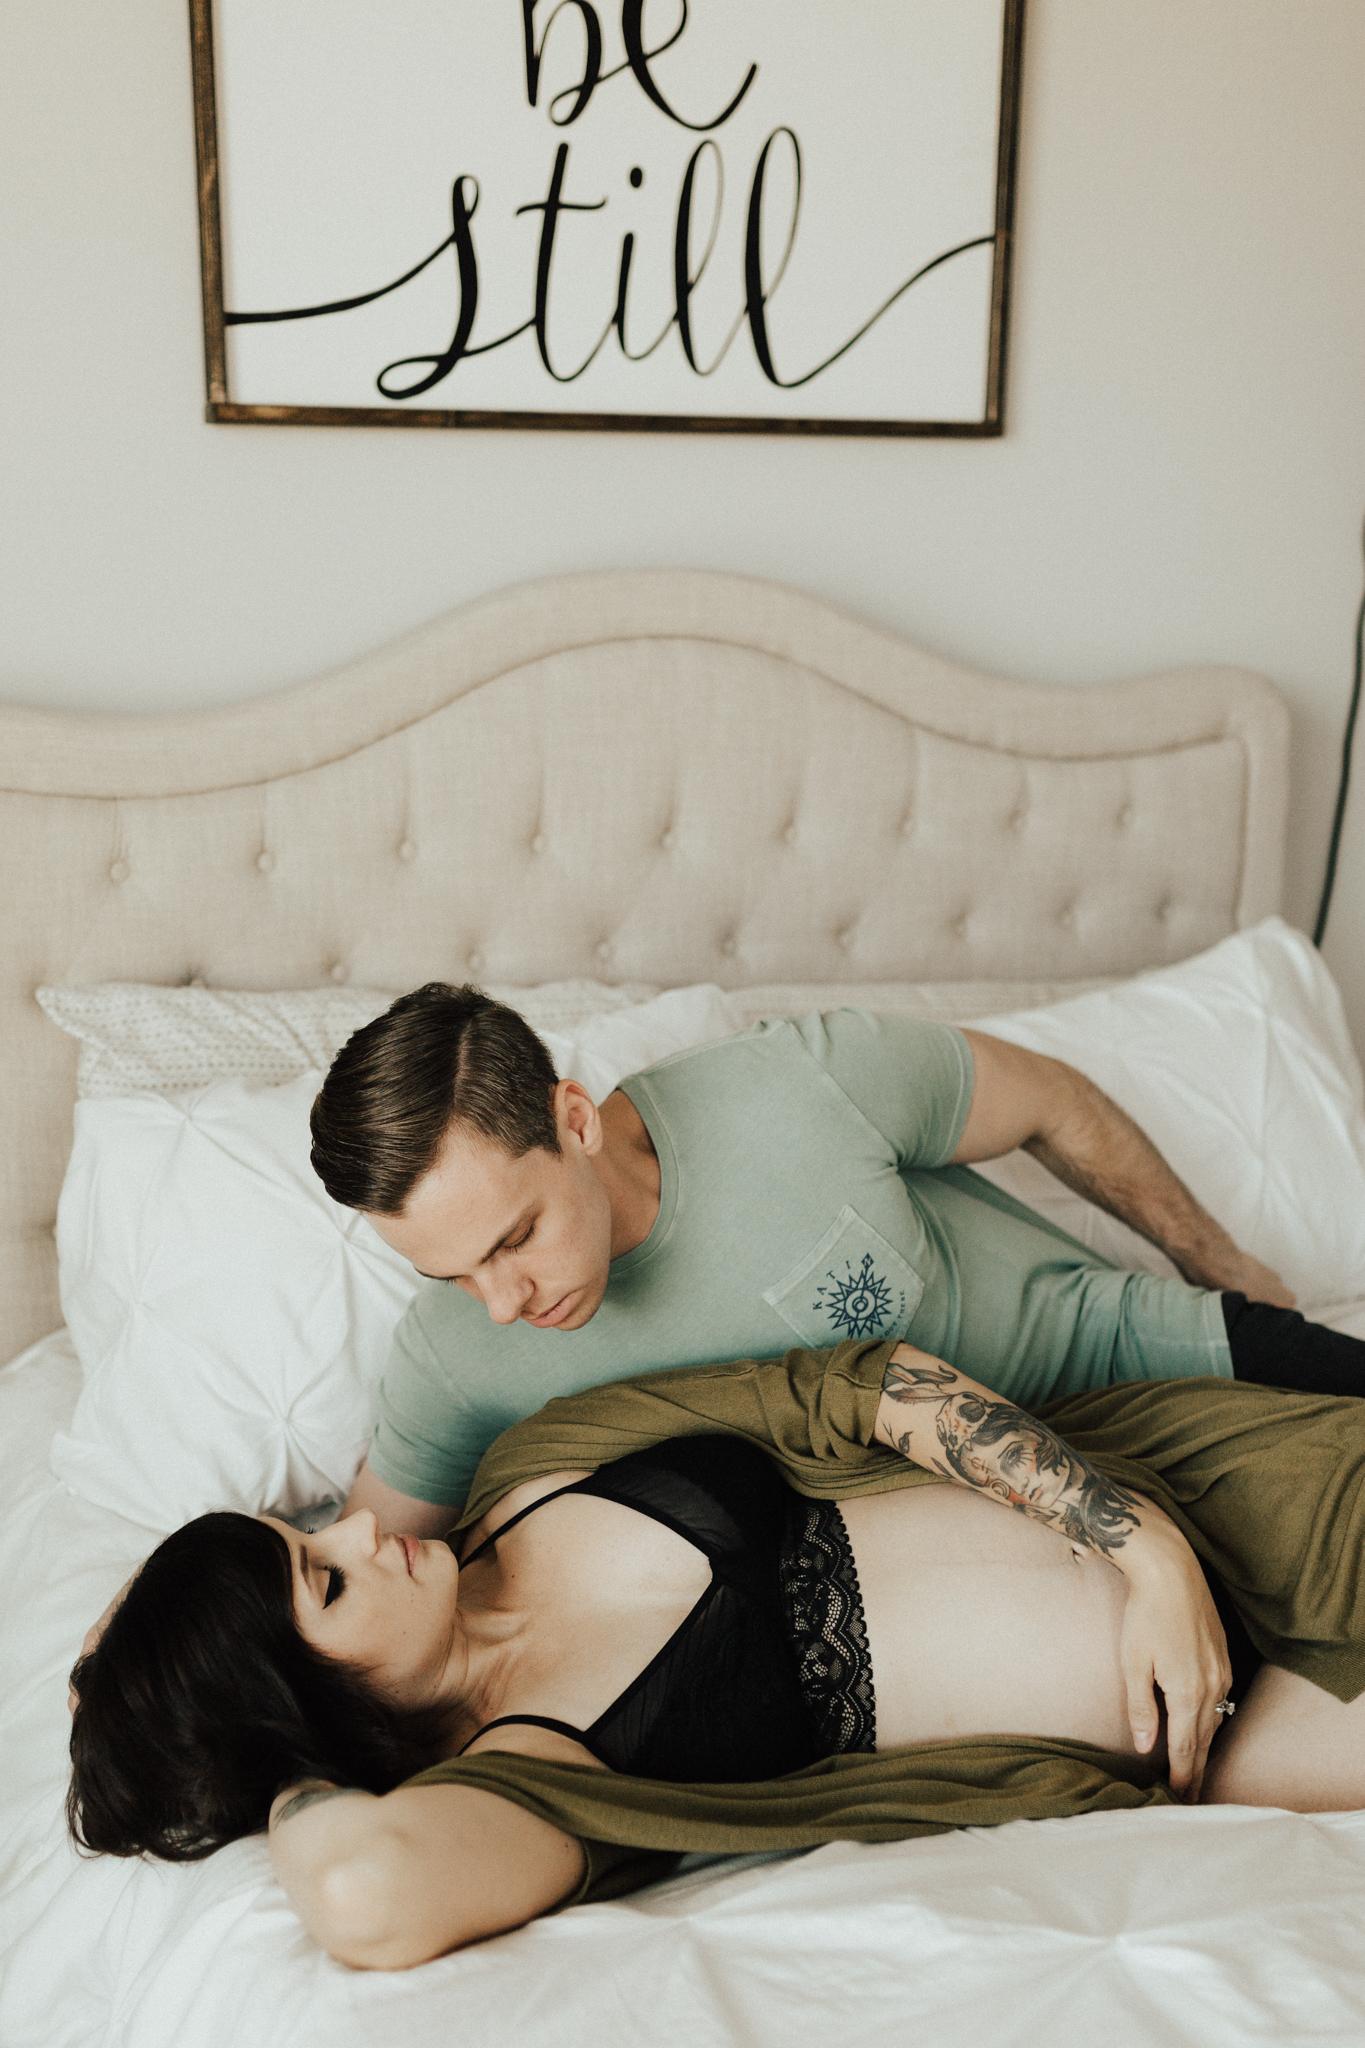 Arizona-Intimate-In-Home-Session-Maternity (5).jpg